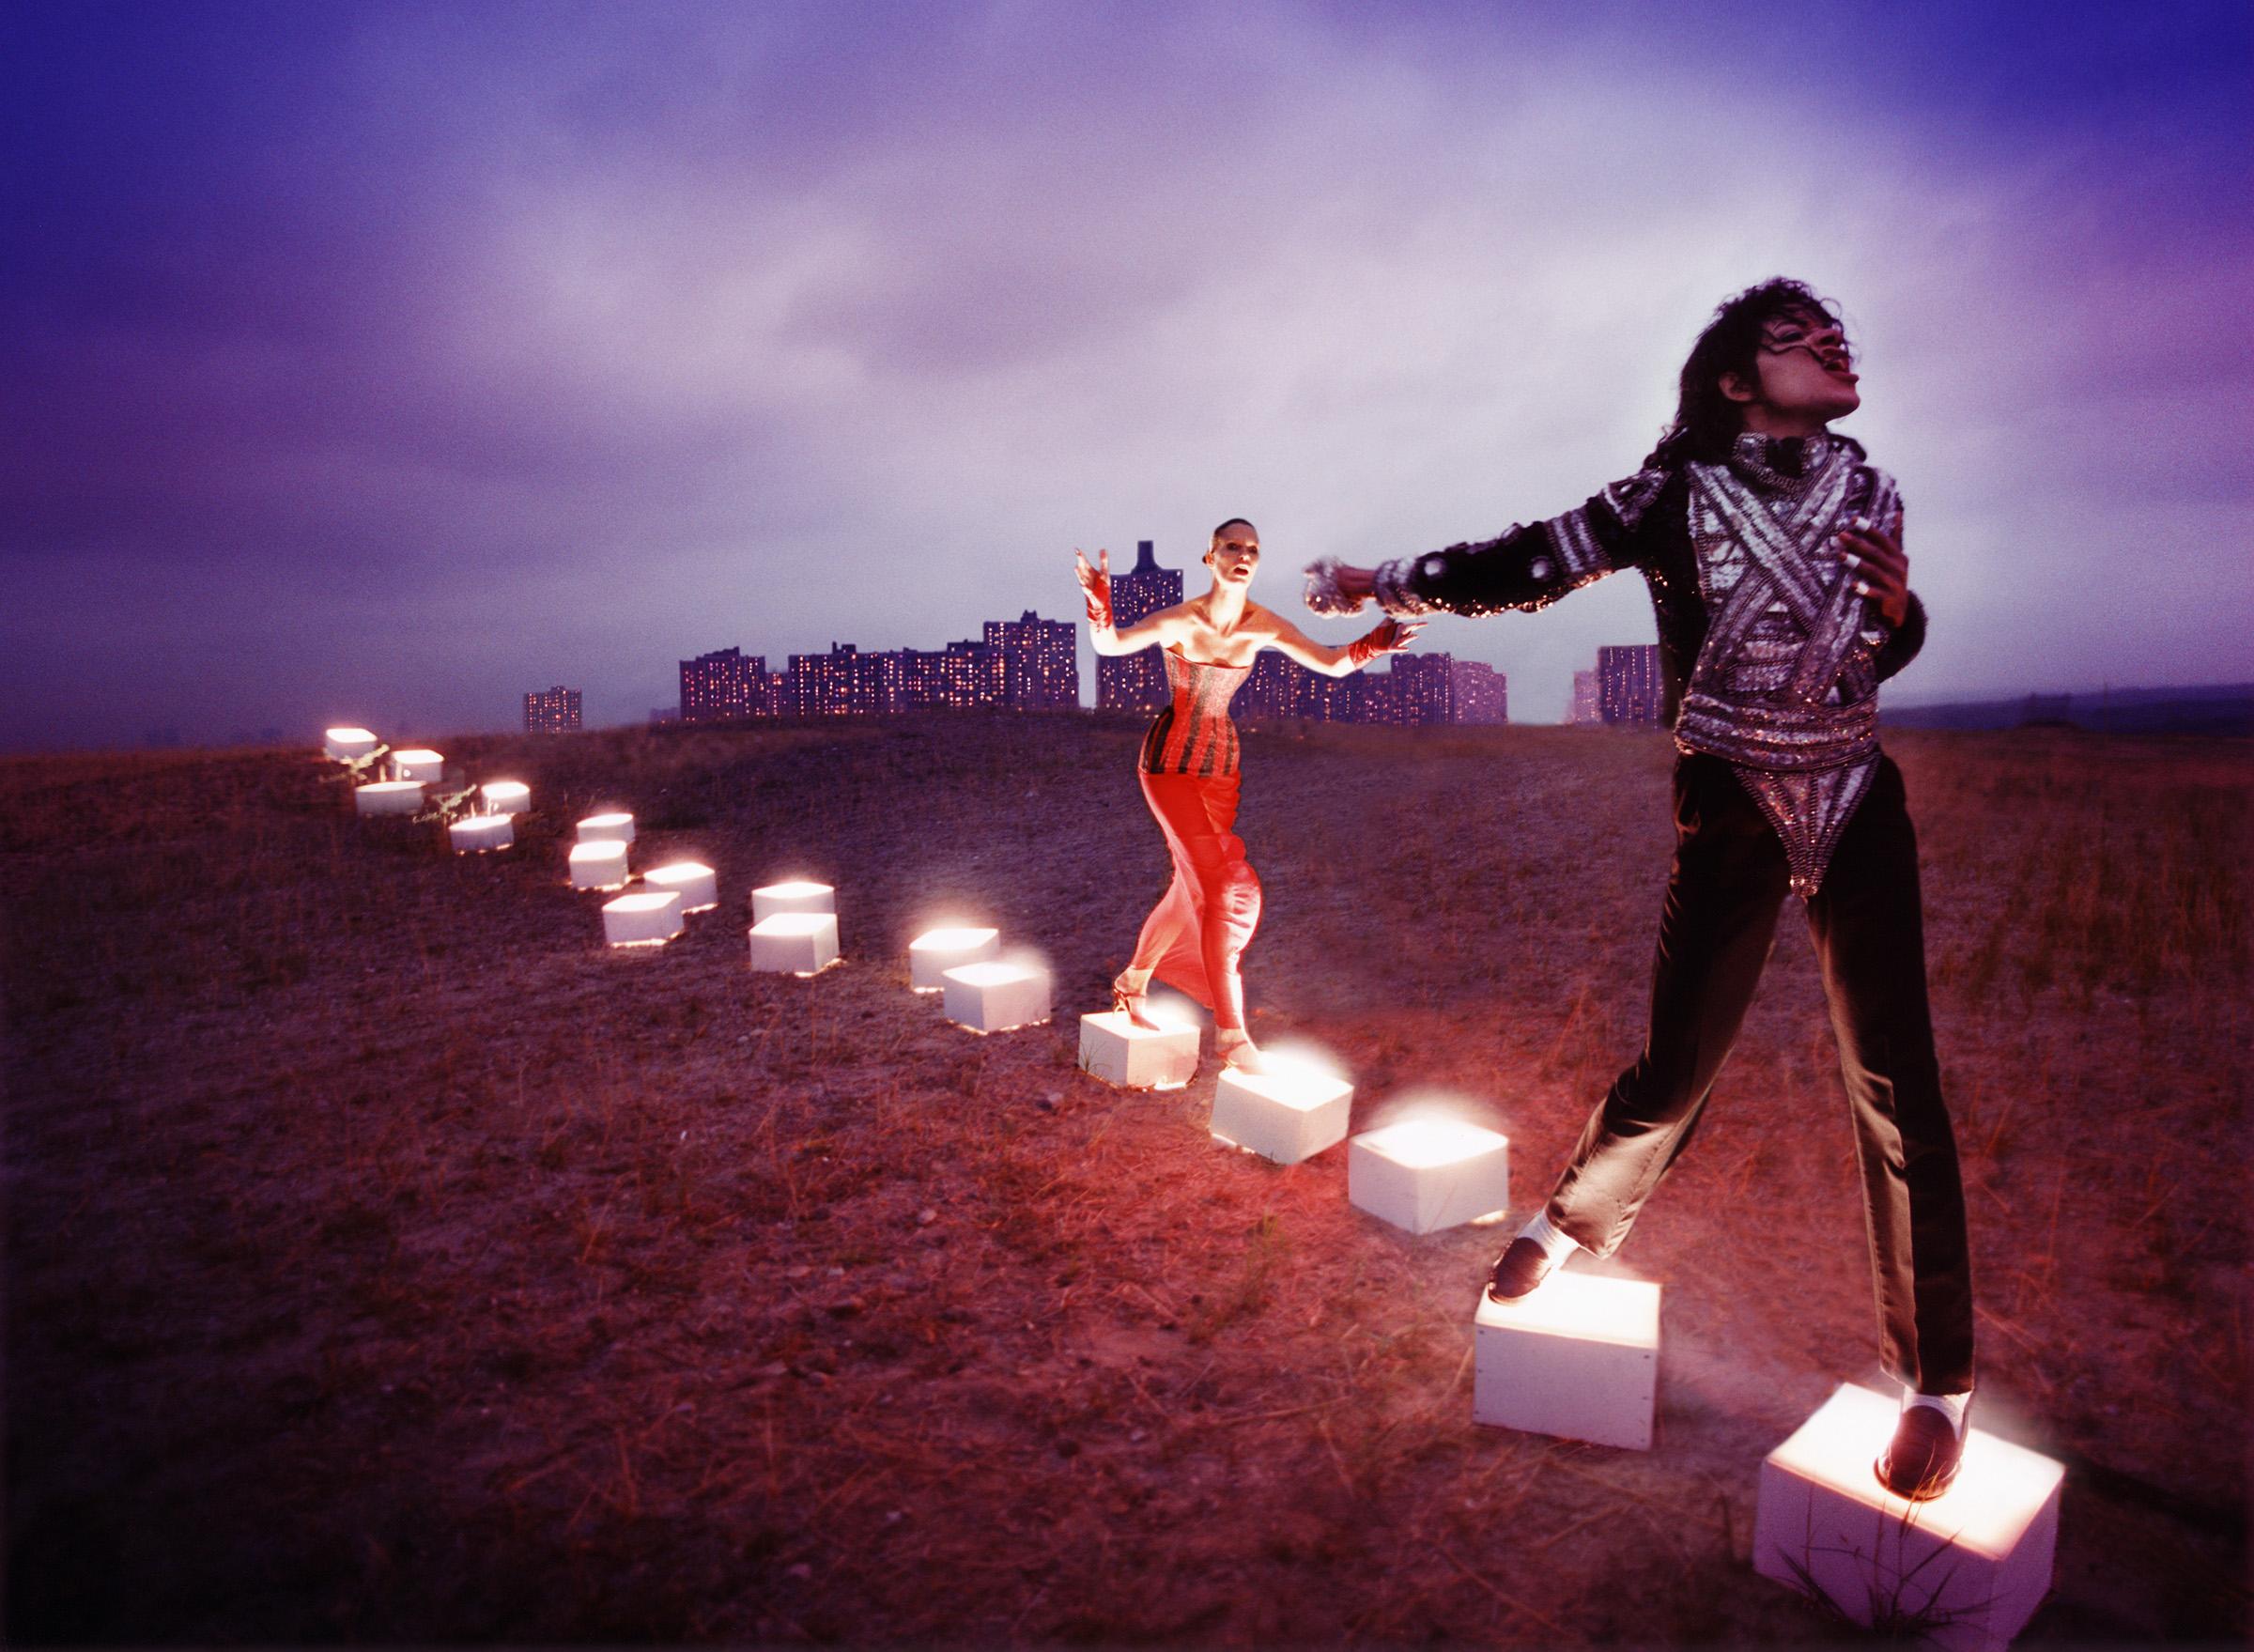 """Michael Jackson: An Illuminating Path, 1998"". David LaChapelle. © David LaChapelle / Courtesy Staley-Wise Gallery, New York"